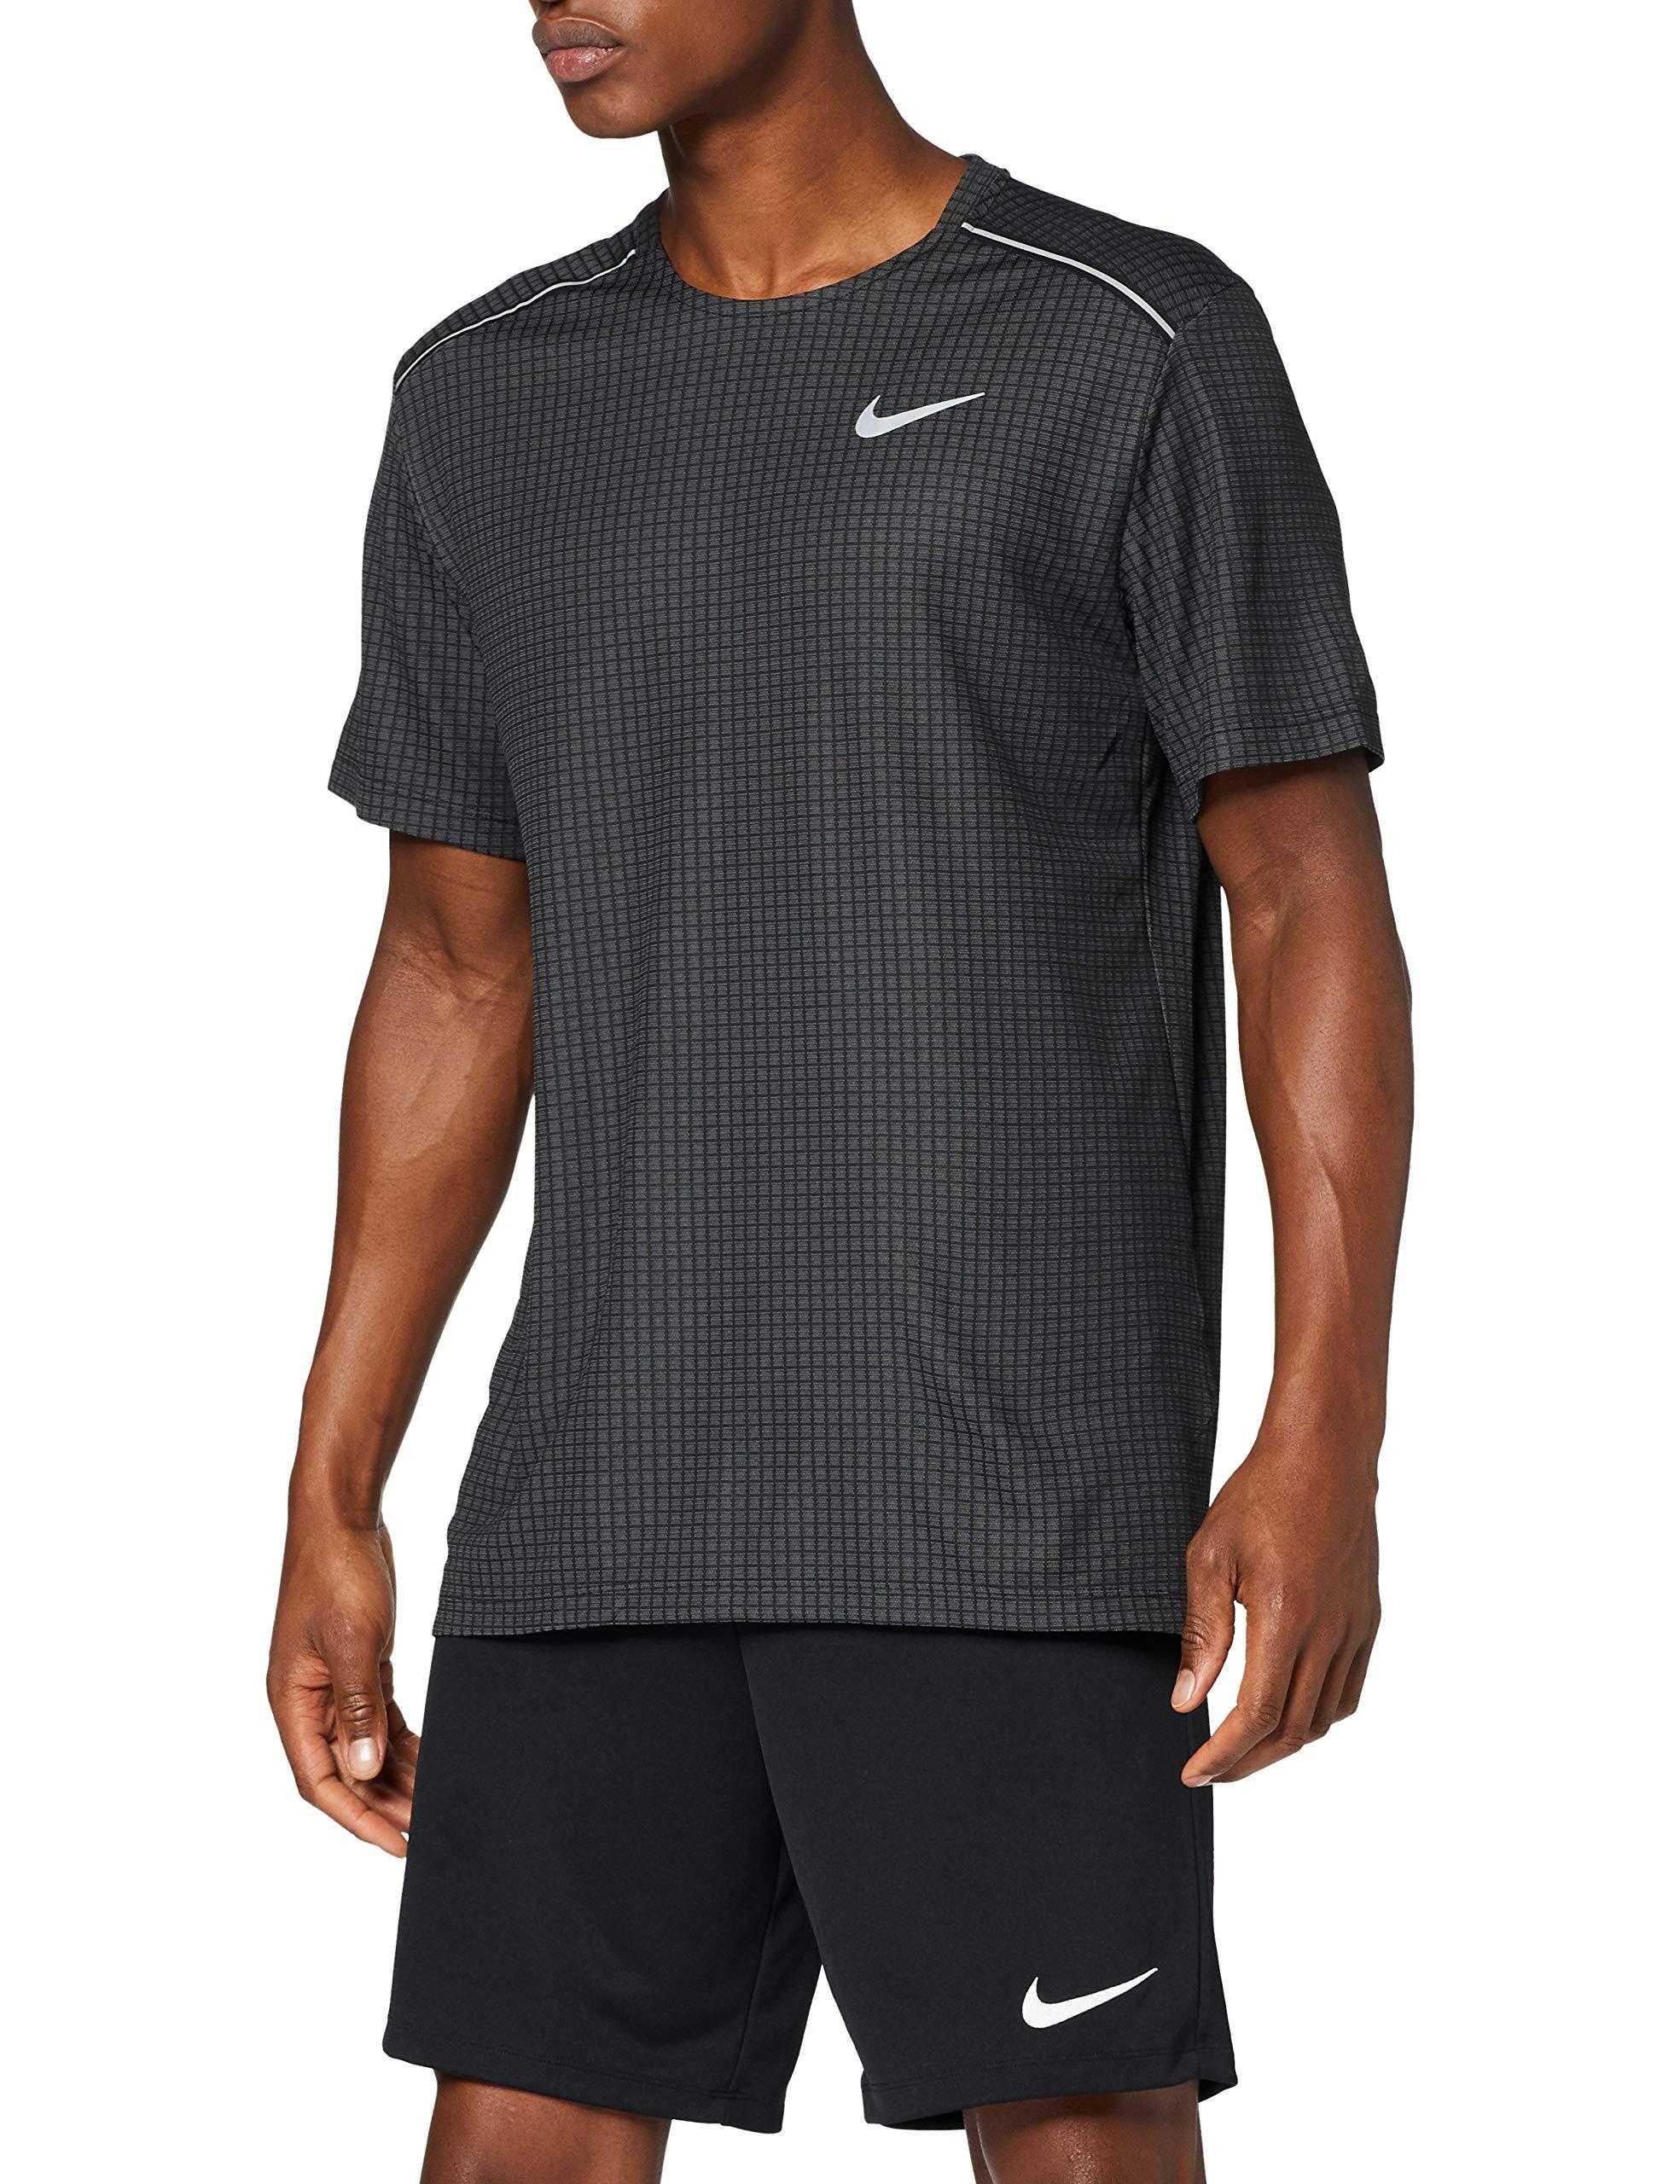 Nike Miler Tech Men Running Top M Black  2Tm8Qrf